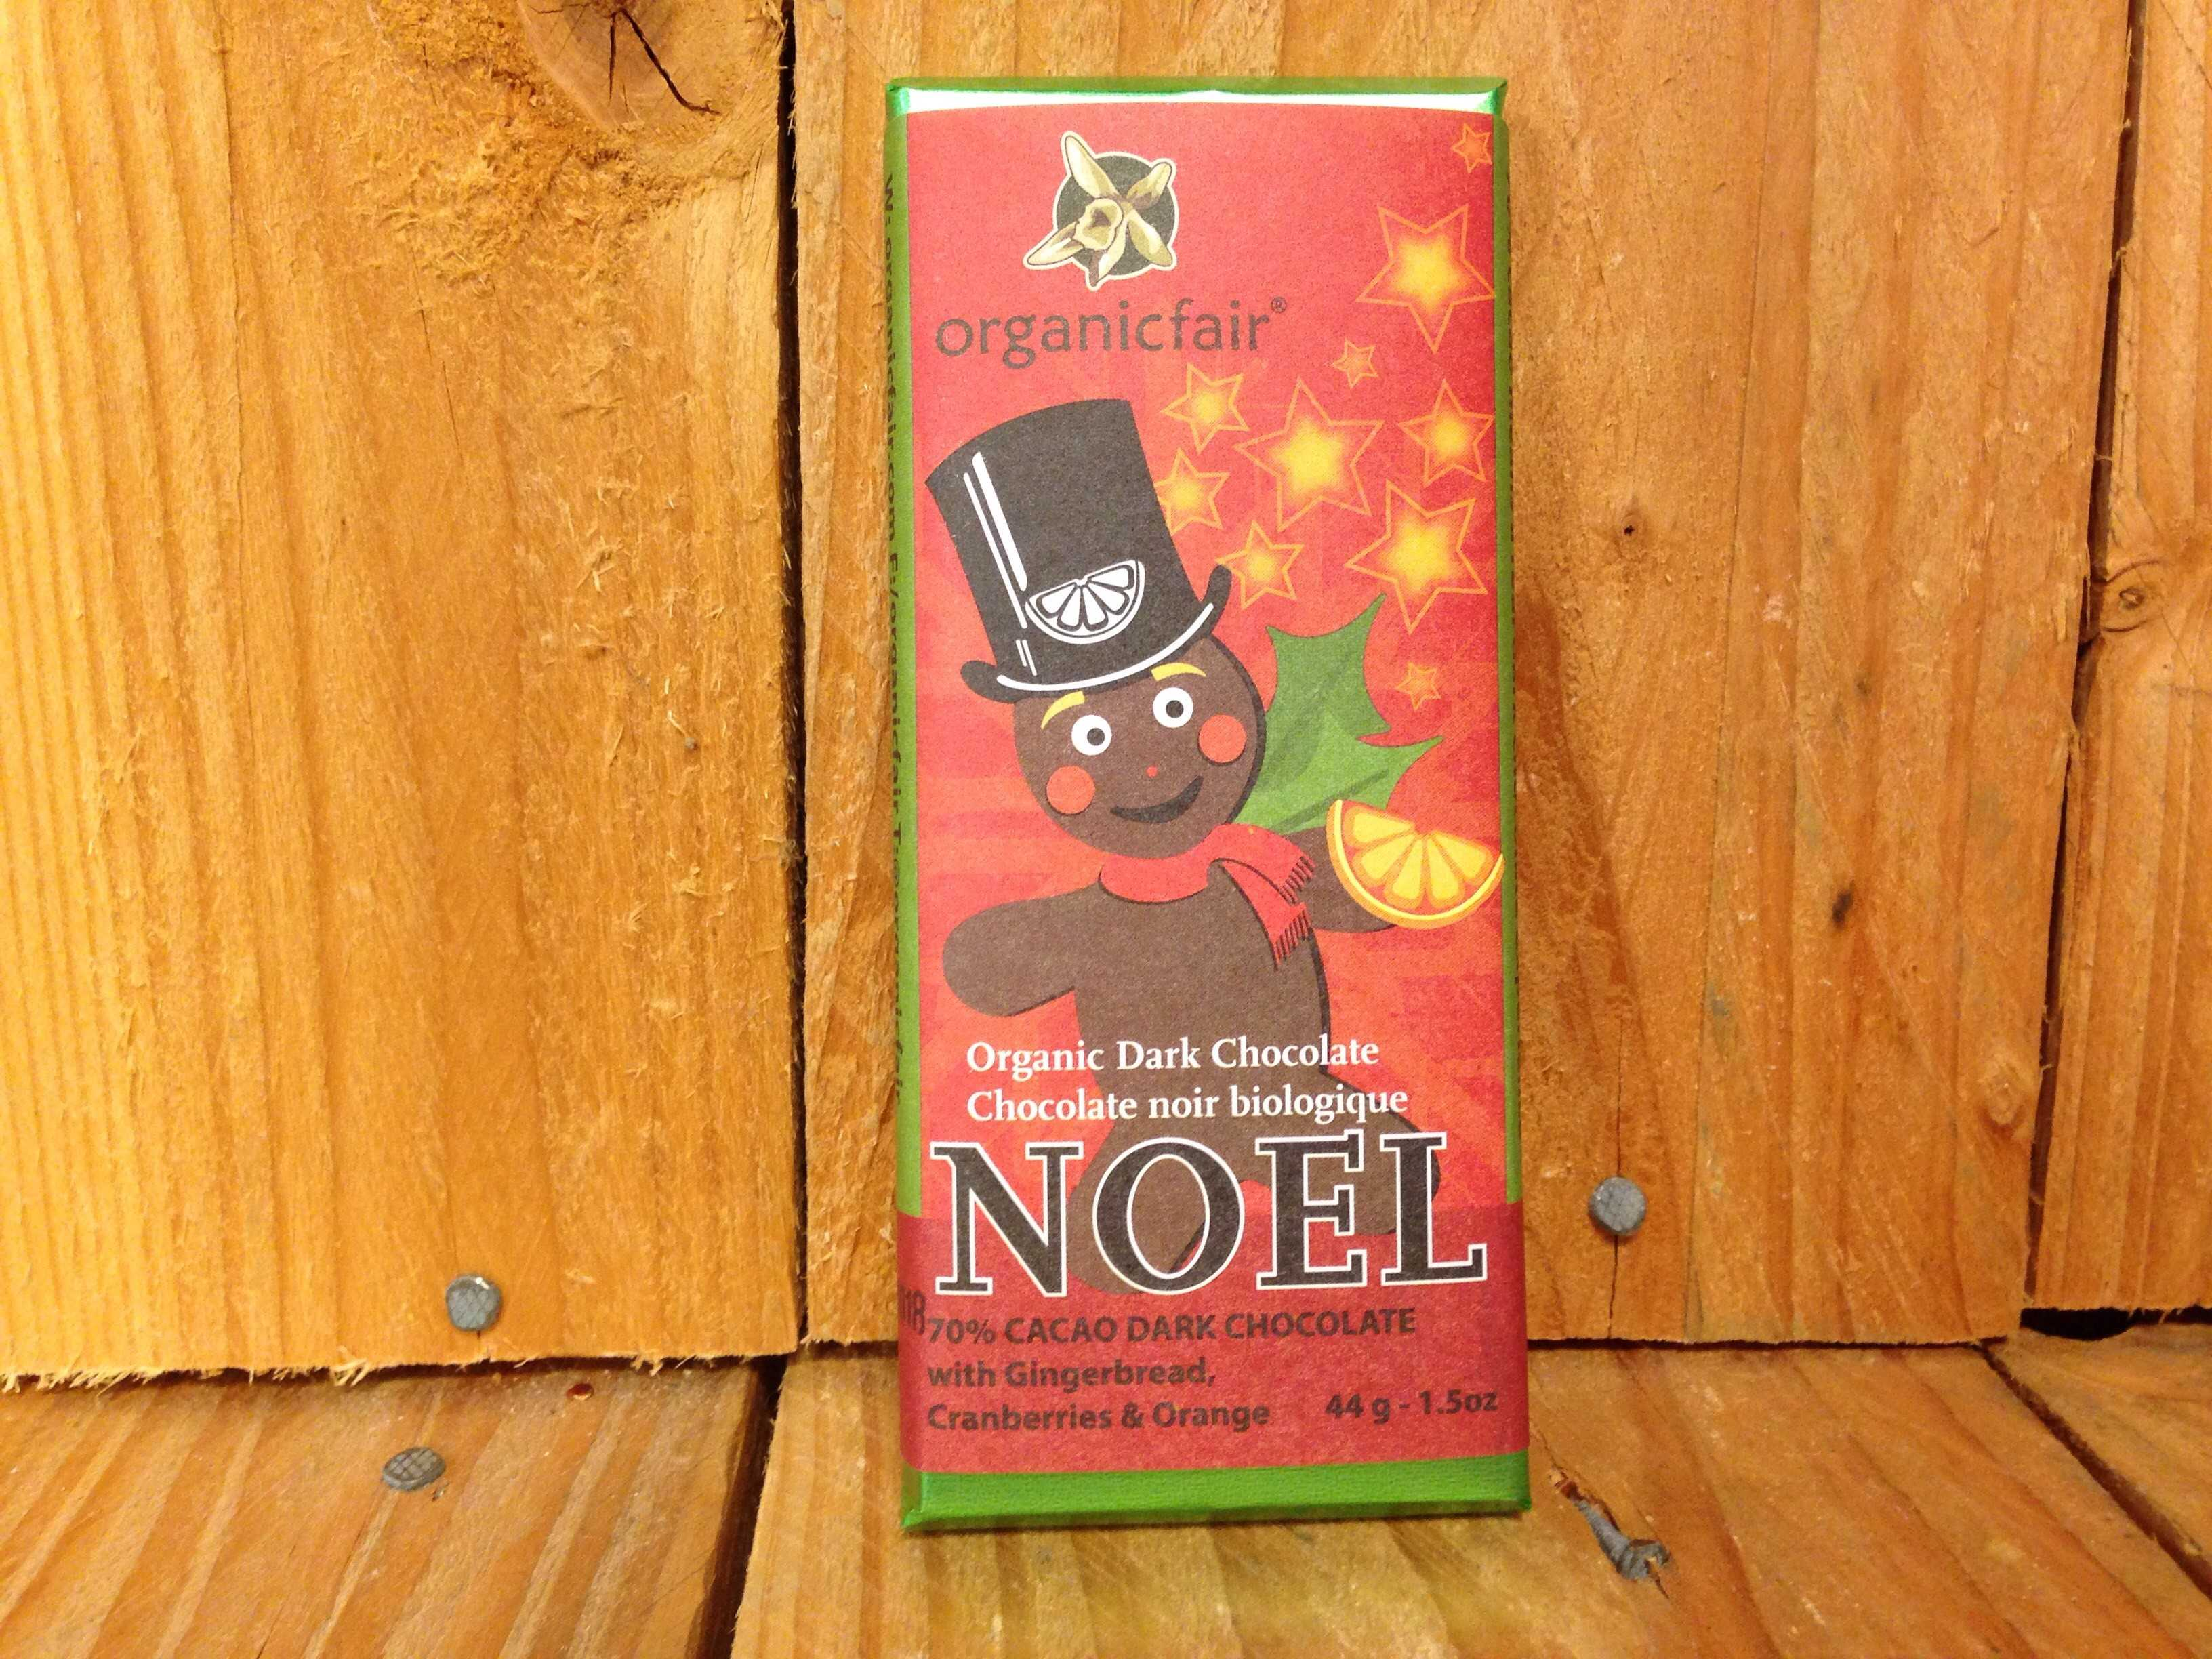 Organic Fair – Chocolate – Noel (43g)